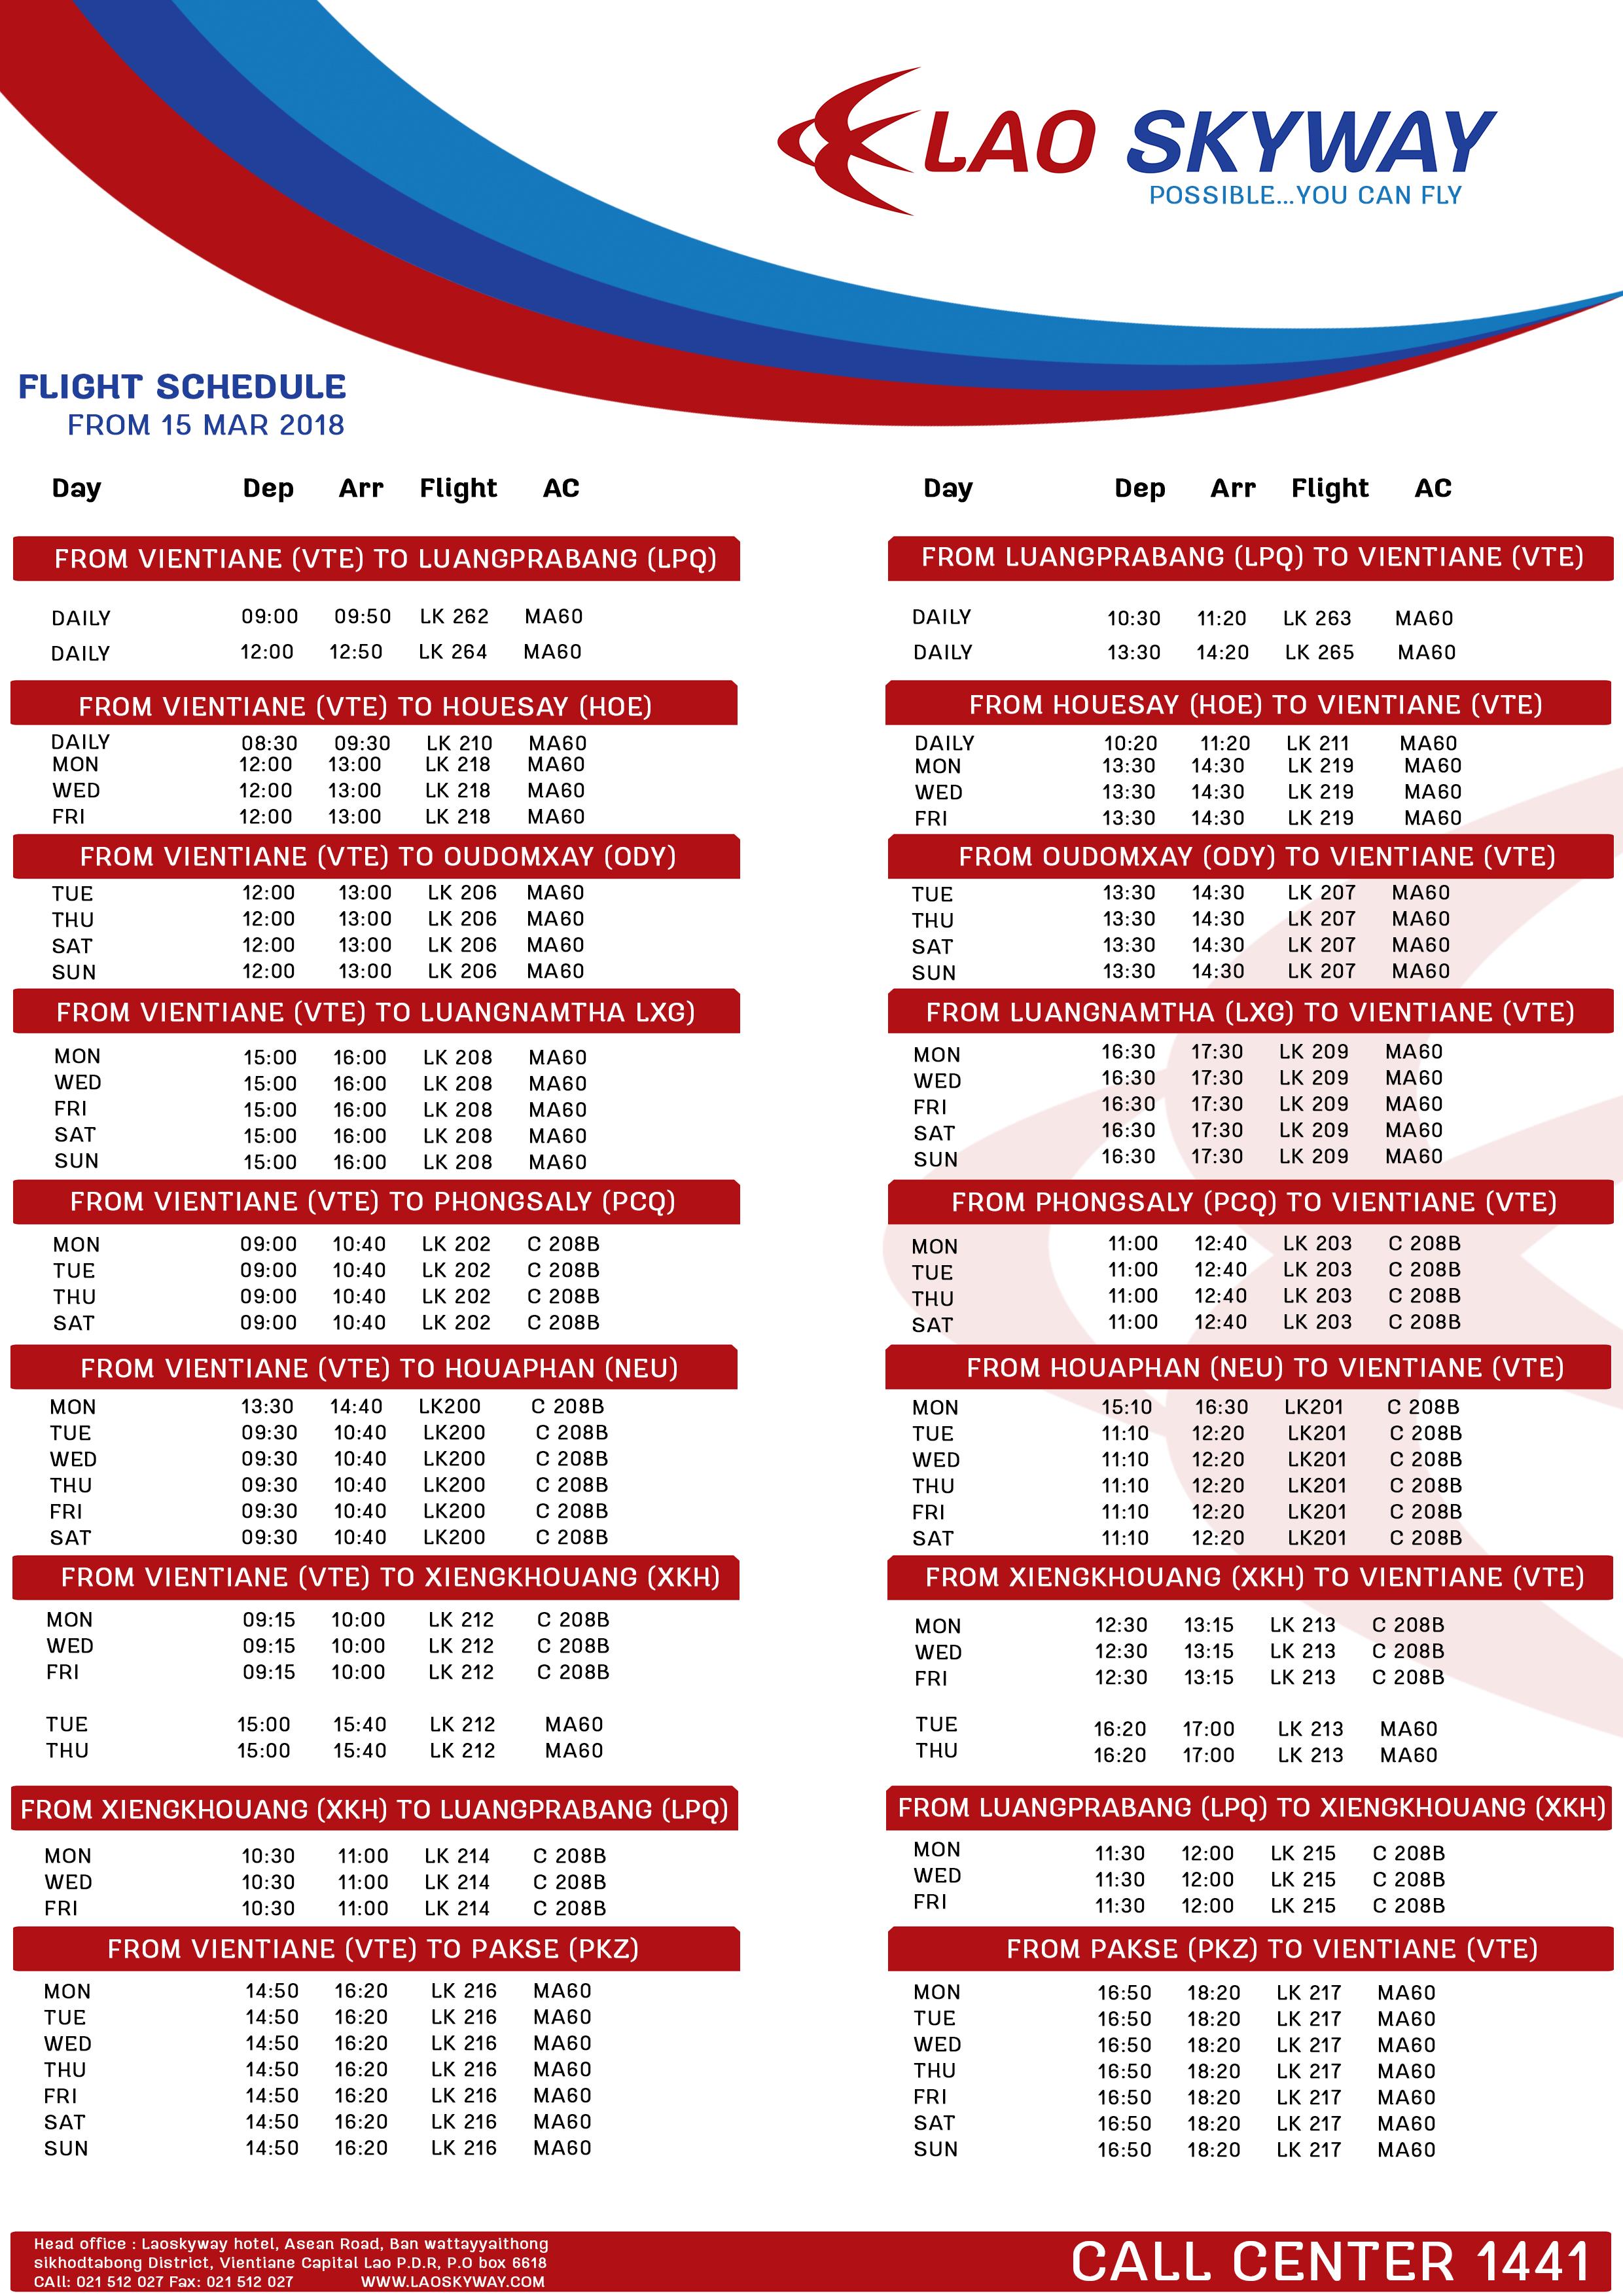 Flight scheduleupdate 19 feb 6